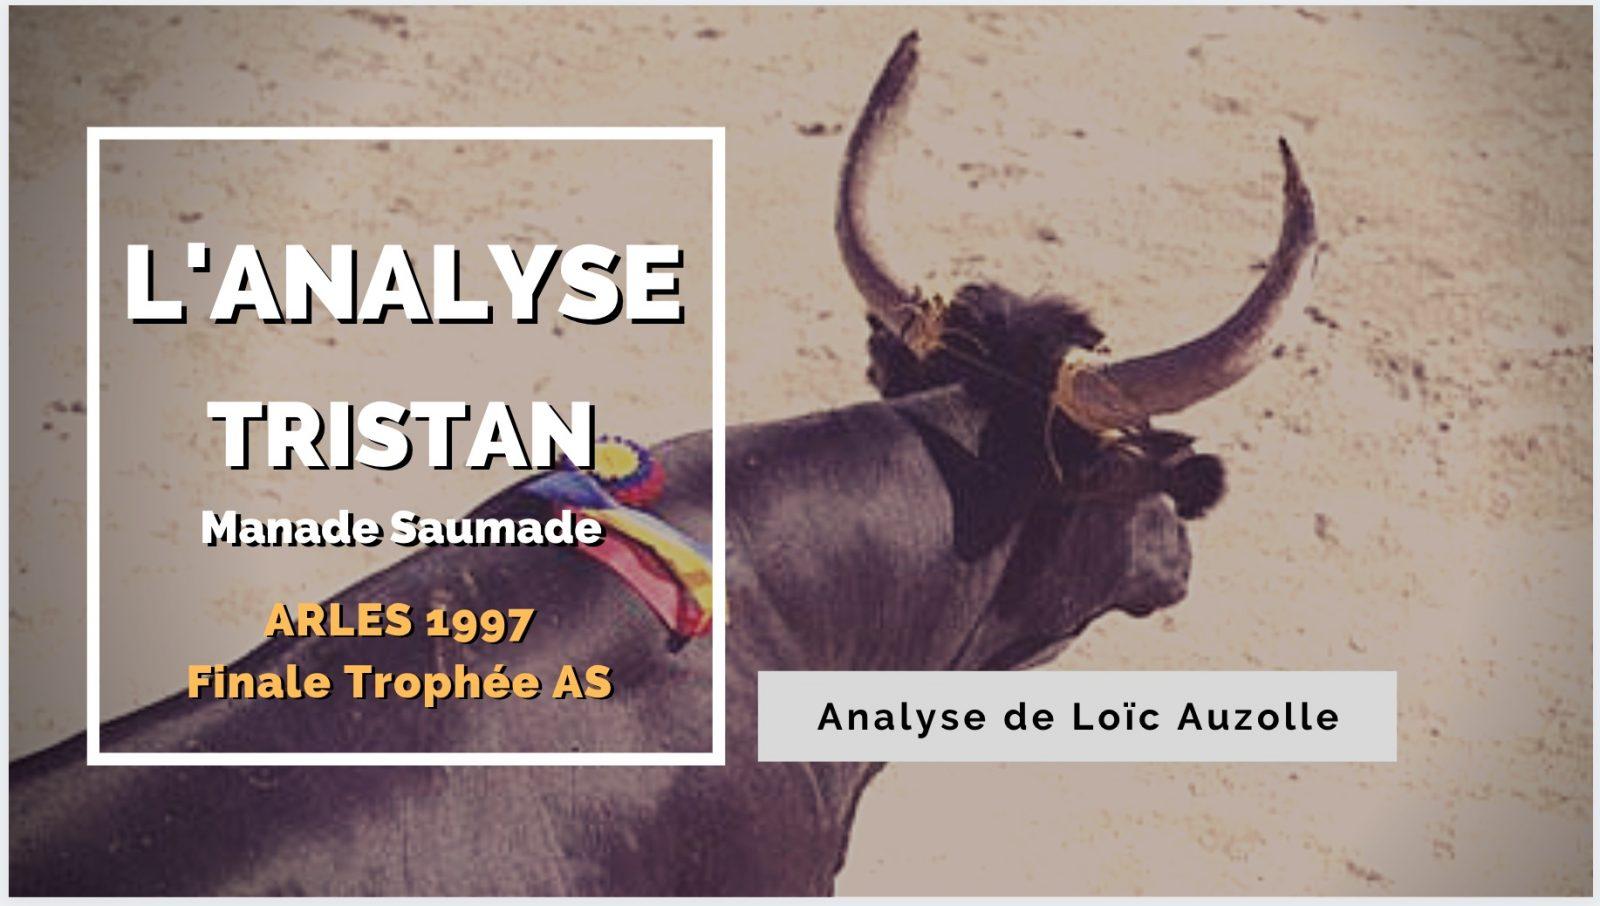 L'ANALYSE – Tristan (Manade Saumade) – Arles 1997 – AU FIL DES BARRIERES